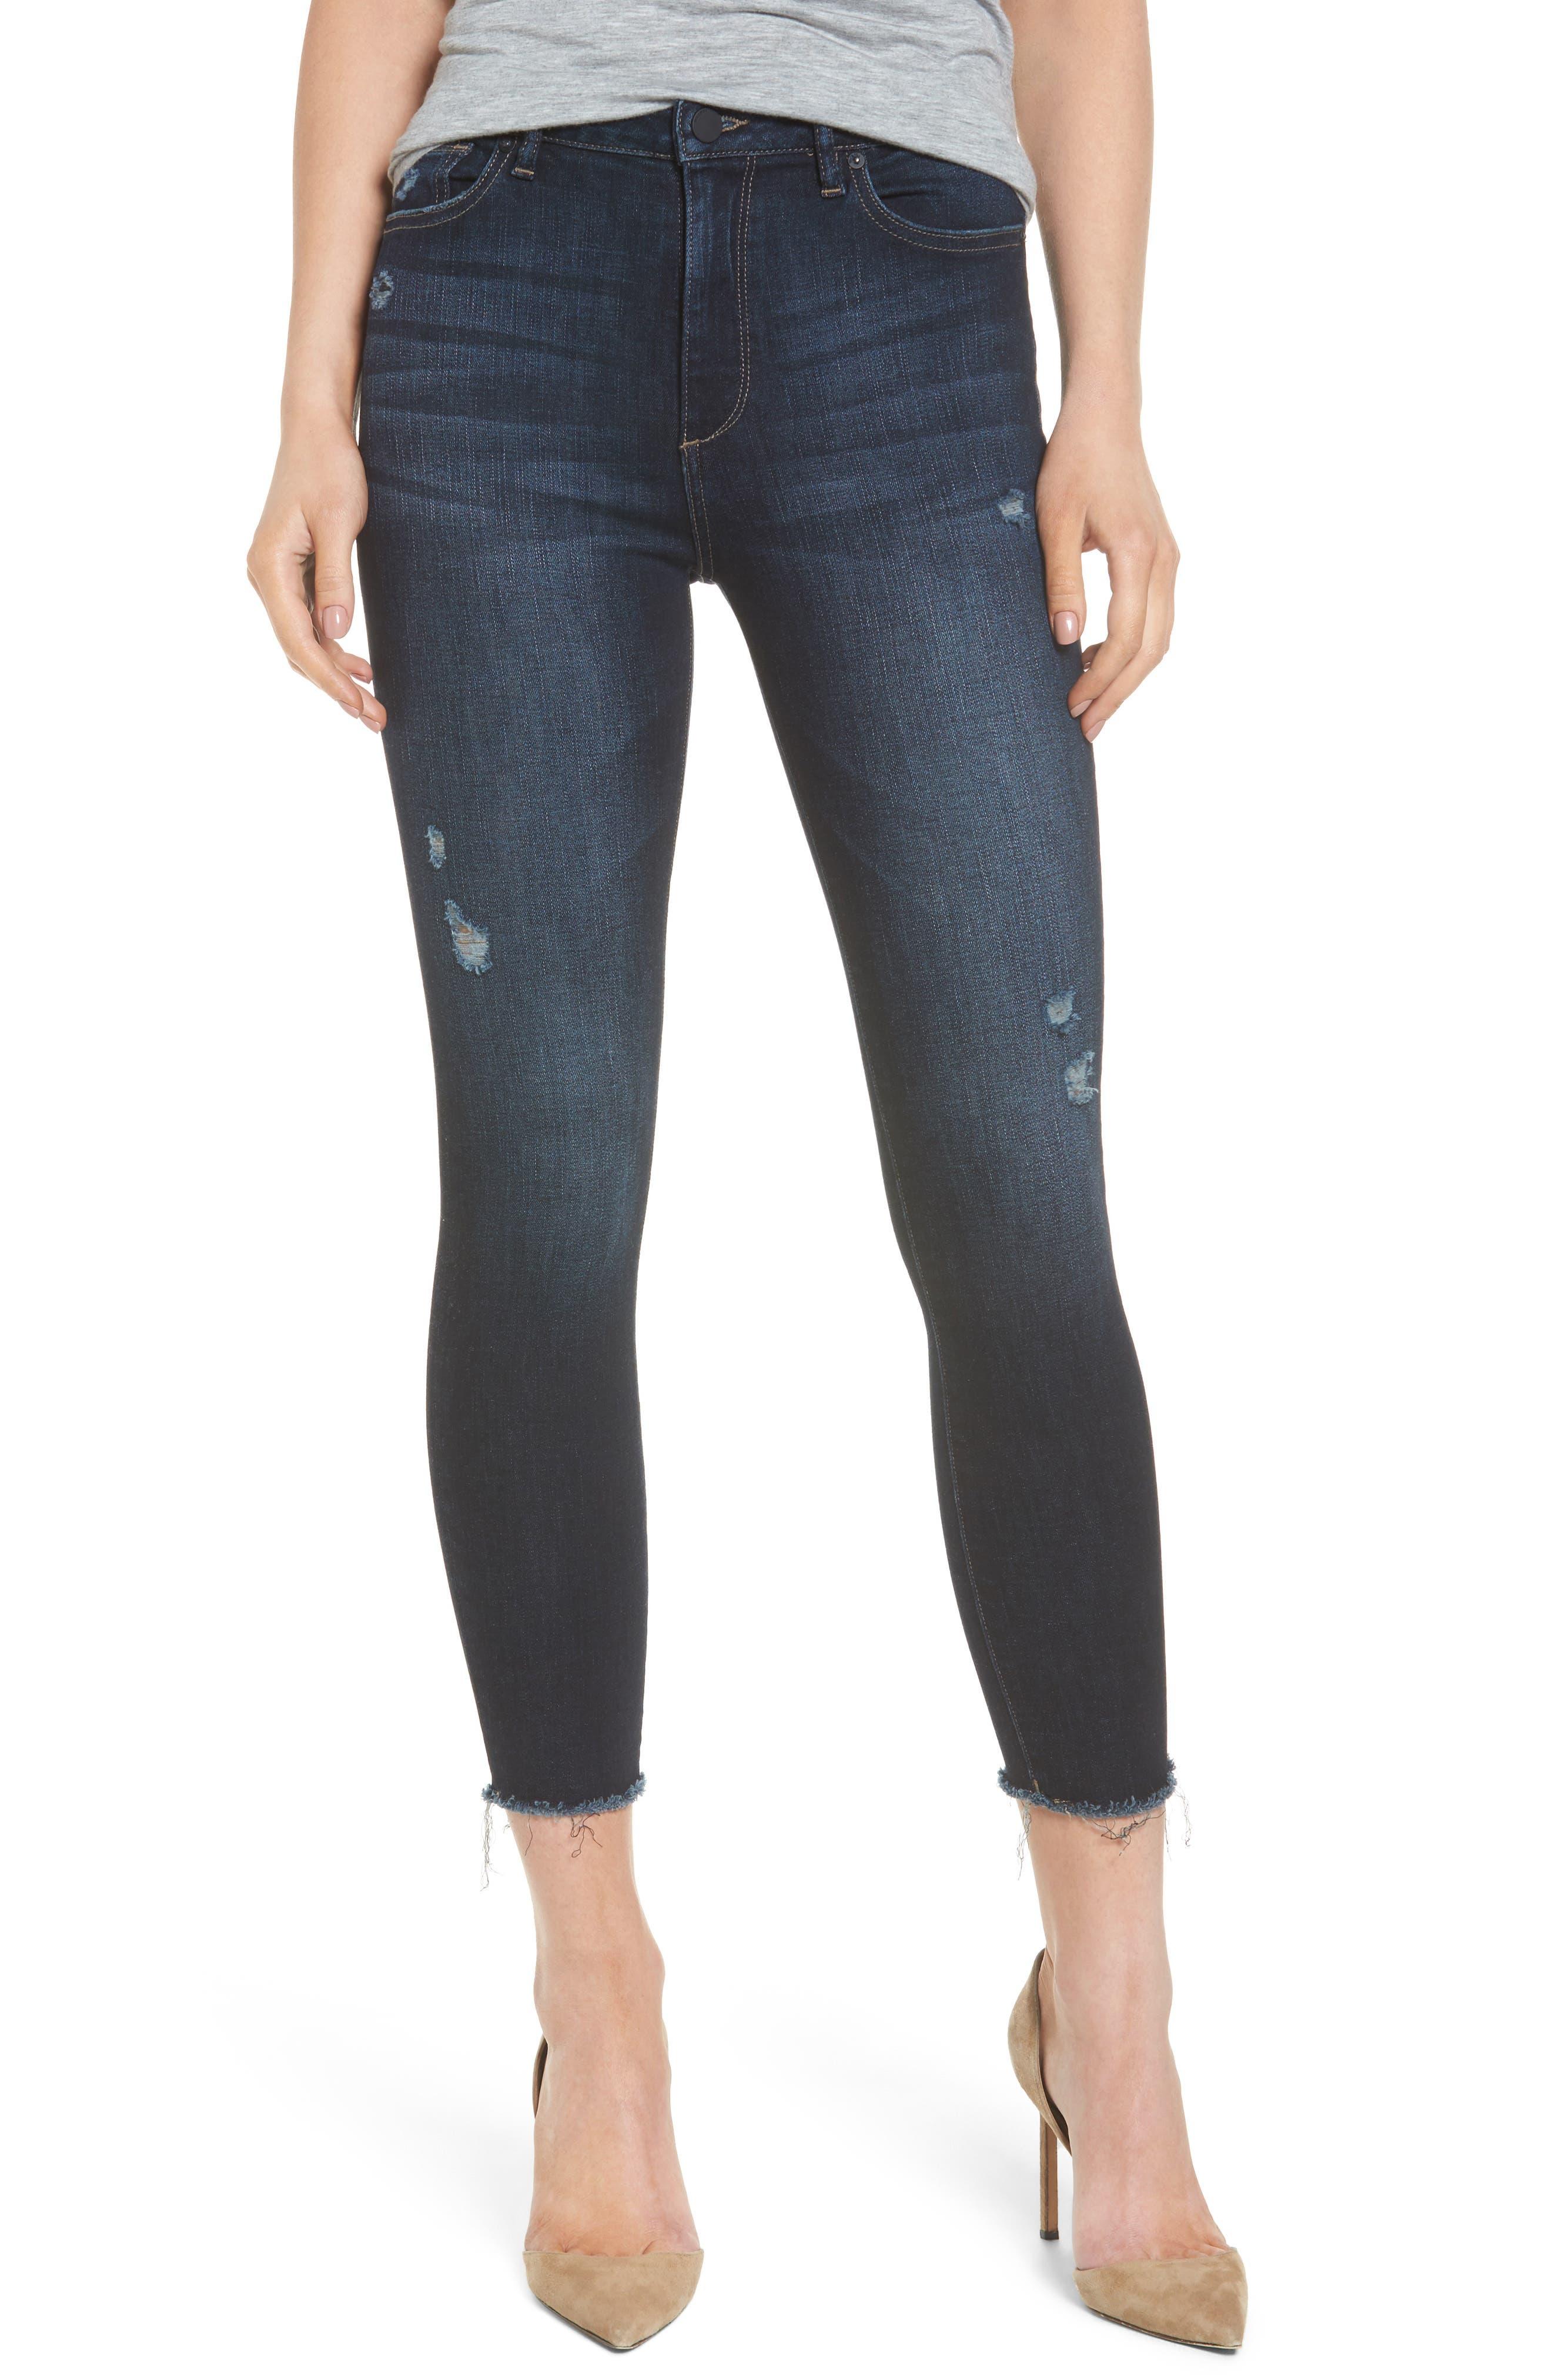 Main Image - DL1961 Chrissy High Waist Crop Skinny Jeans (Trinity)